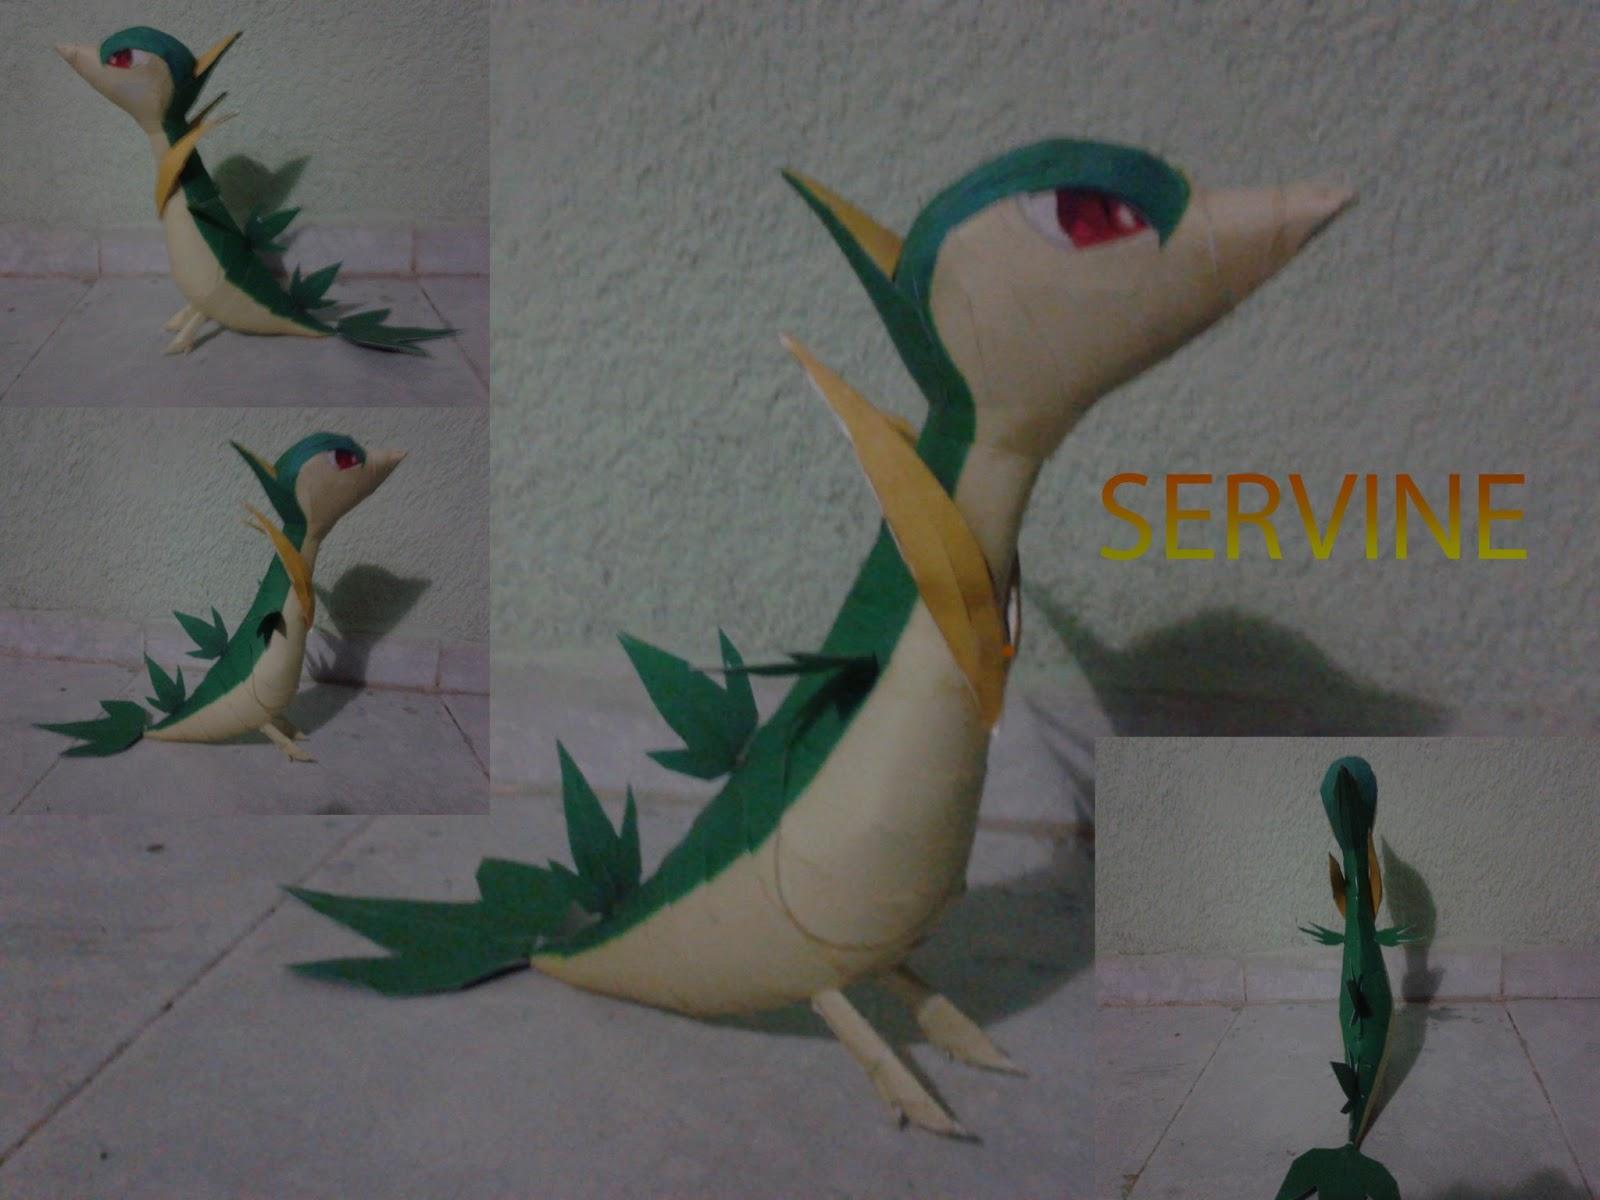 Pokemon Servine Papercraft